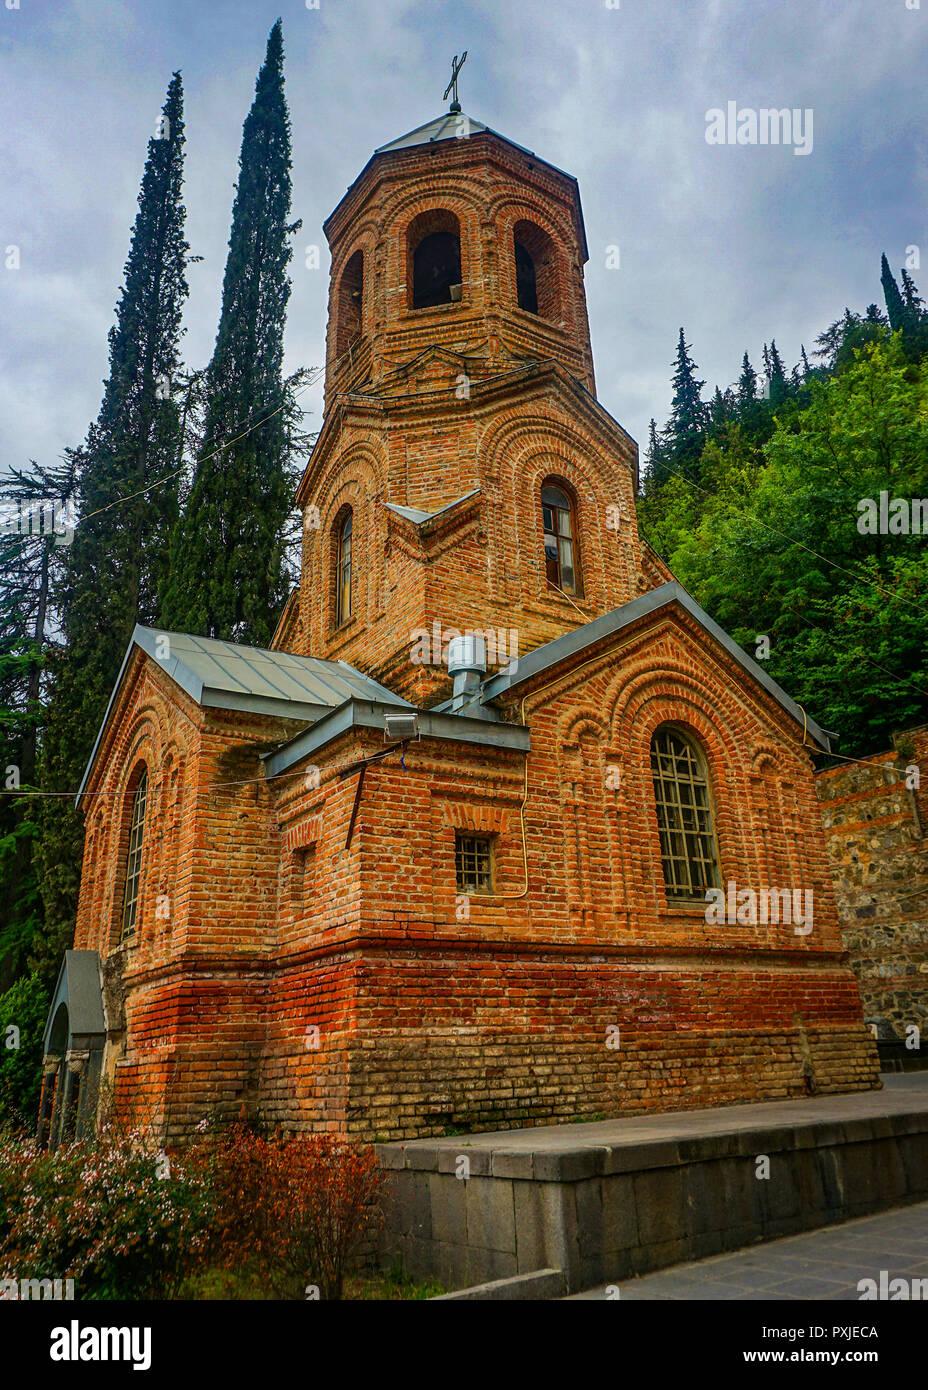 Tiflis Mamadaviti Kuppelkirche Glockenturm Blick an einem regnerischen Tag Stockbild